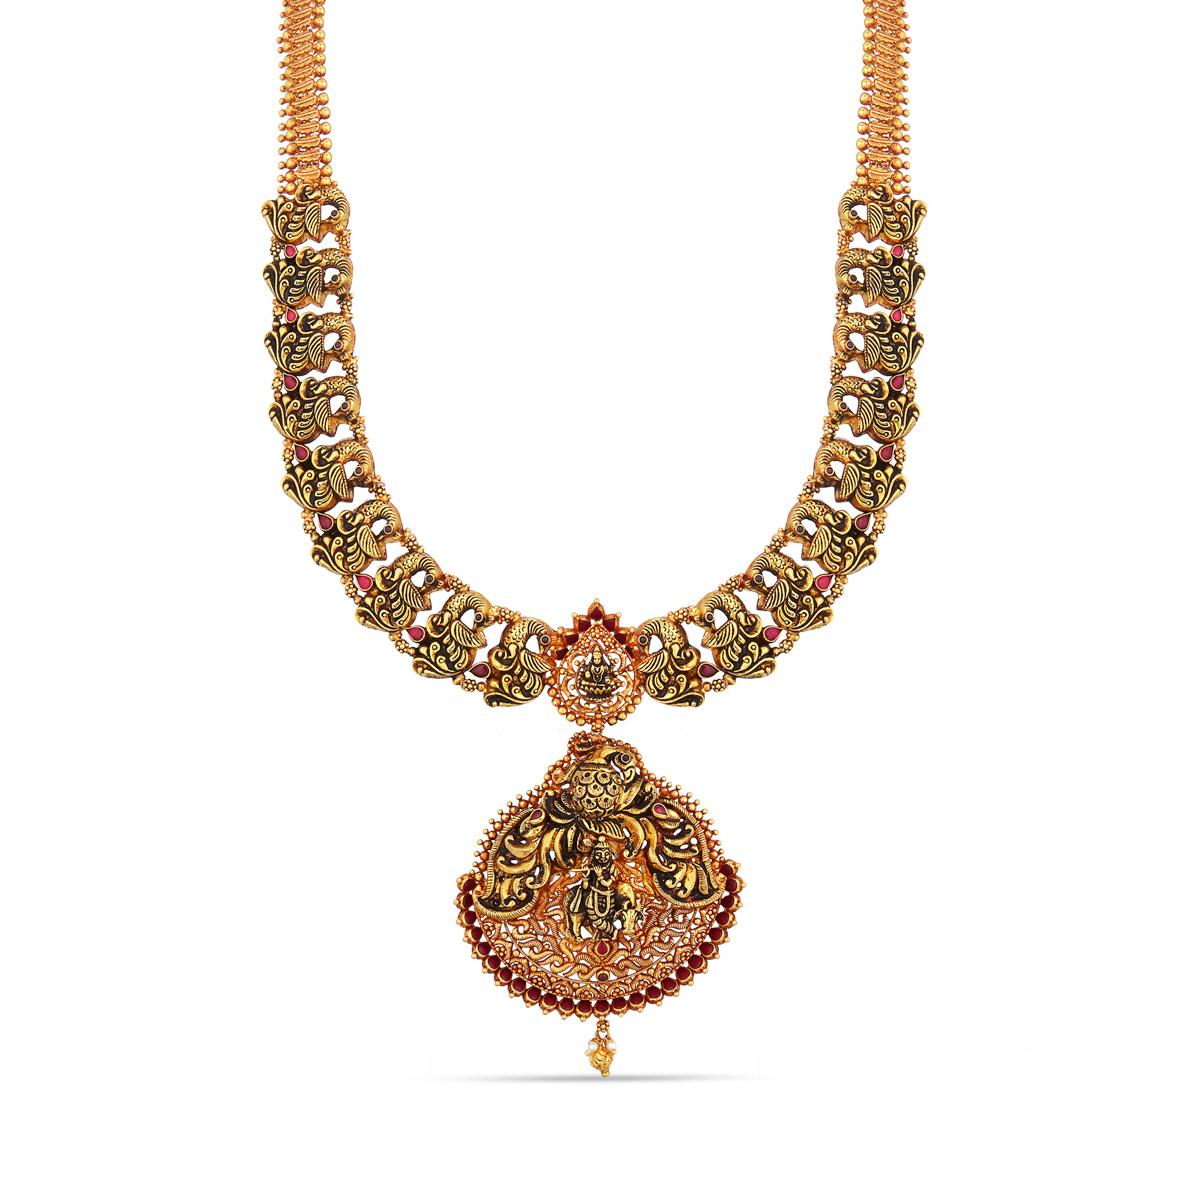 Stunning Lakshmi Haram